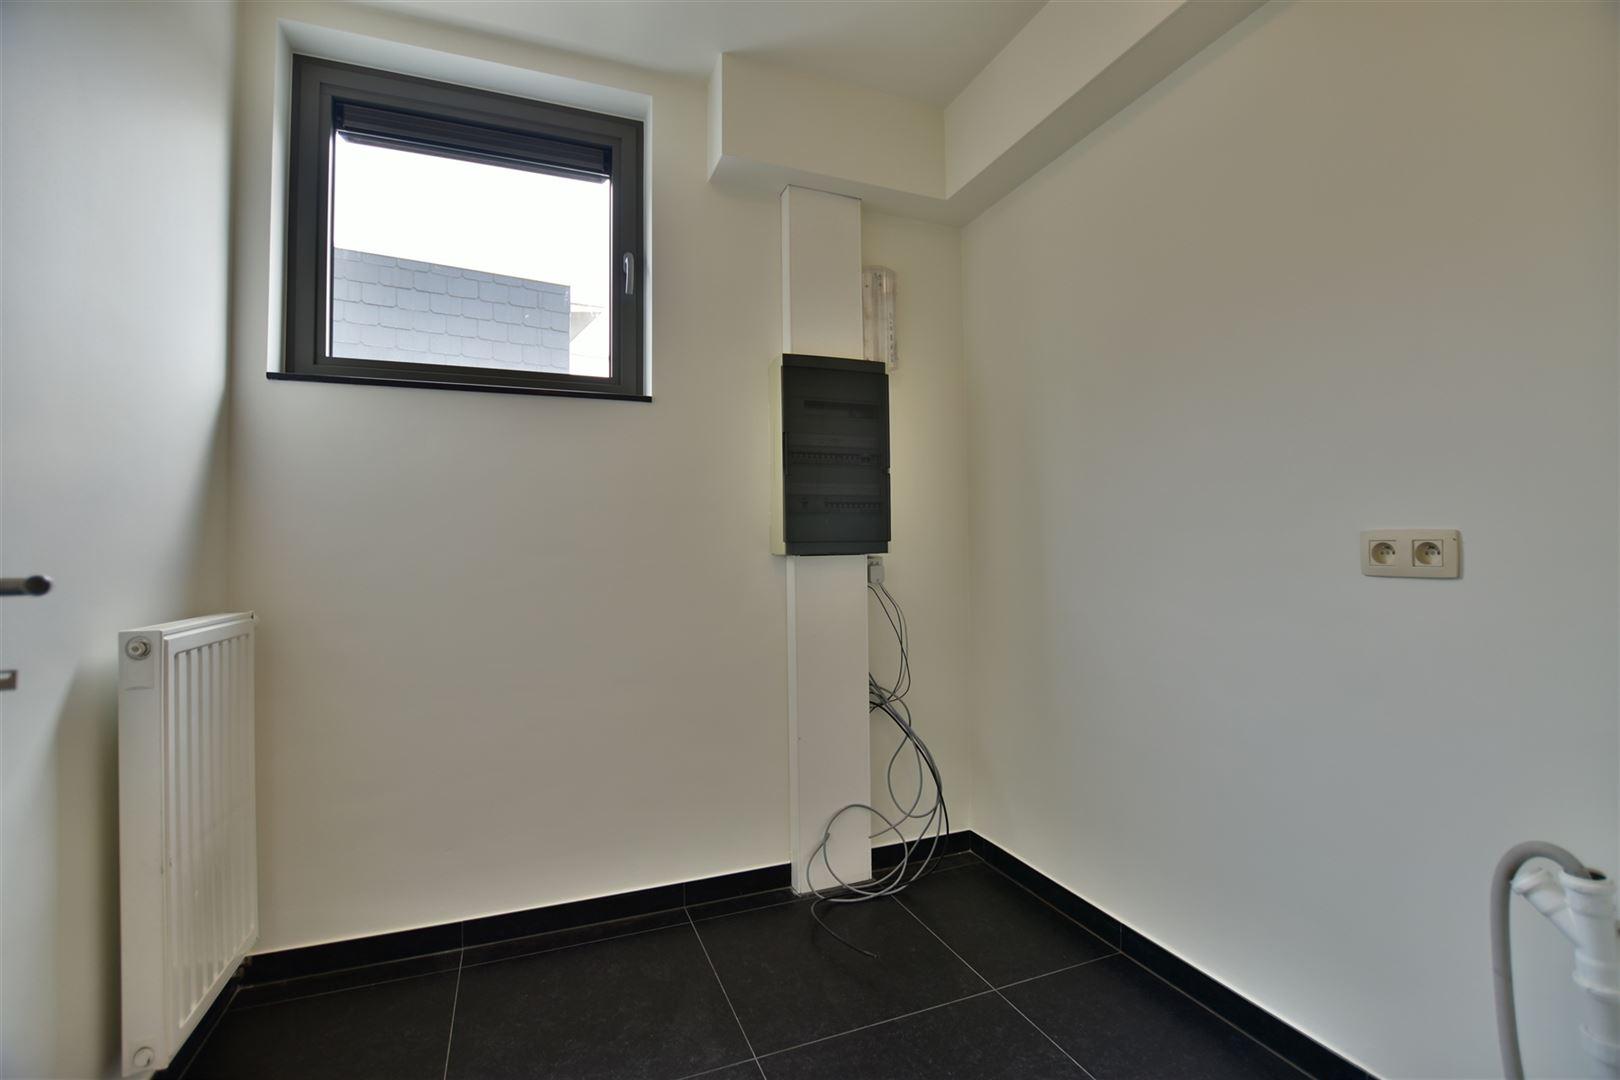 Foto 11 : Duplex/Penthouse te 9200 Sint-Gillis-bij-Dendermonde (België) - Prijs € 278.000